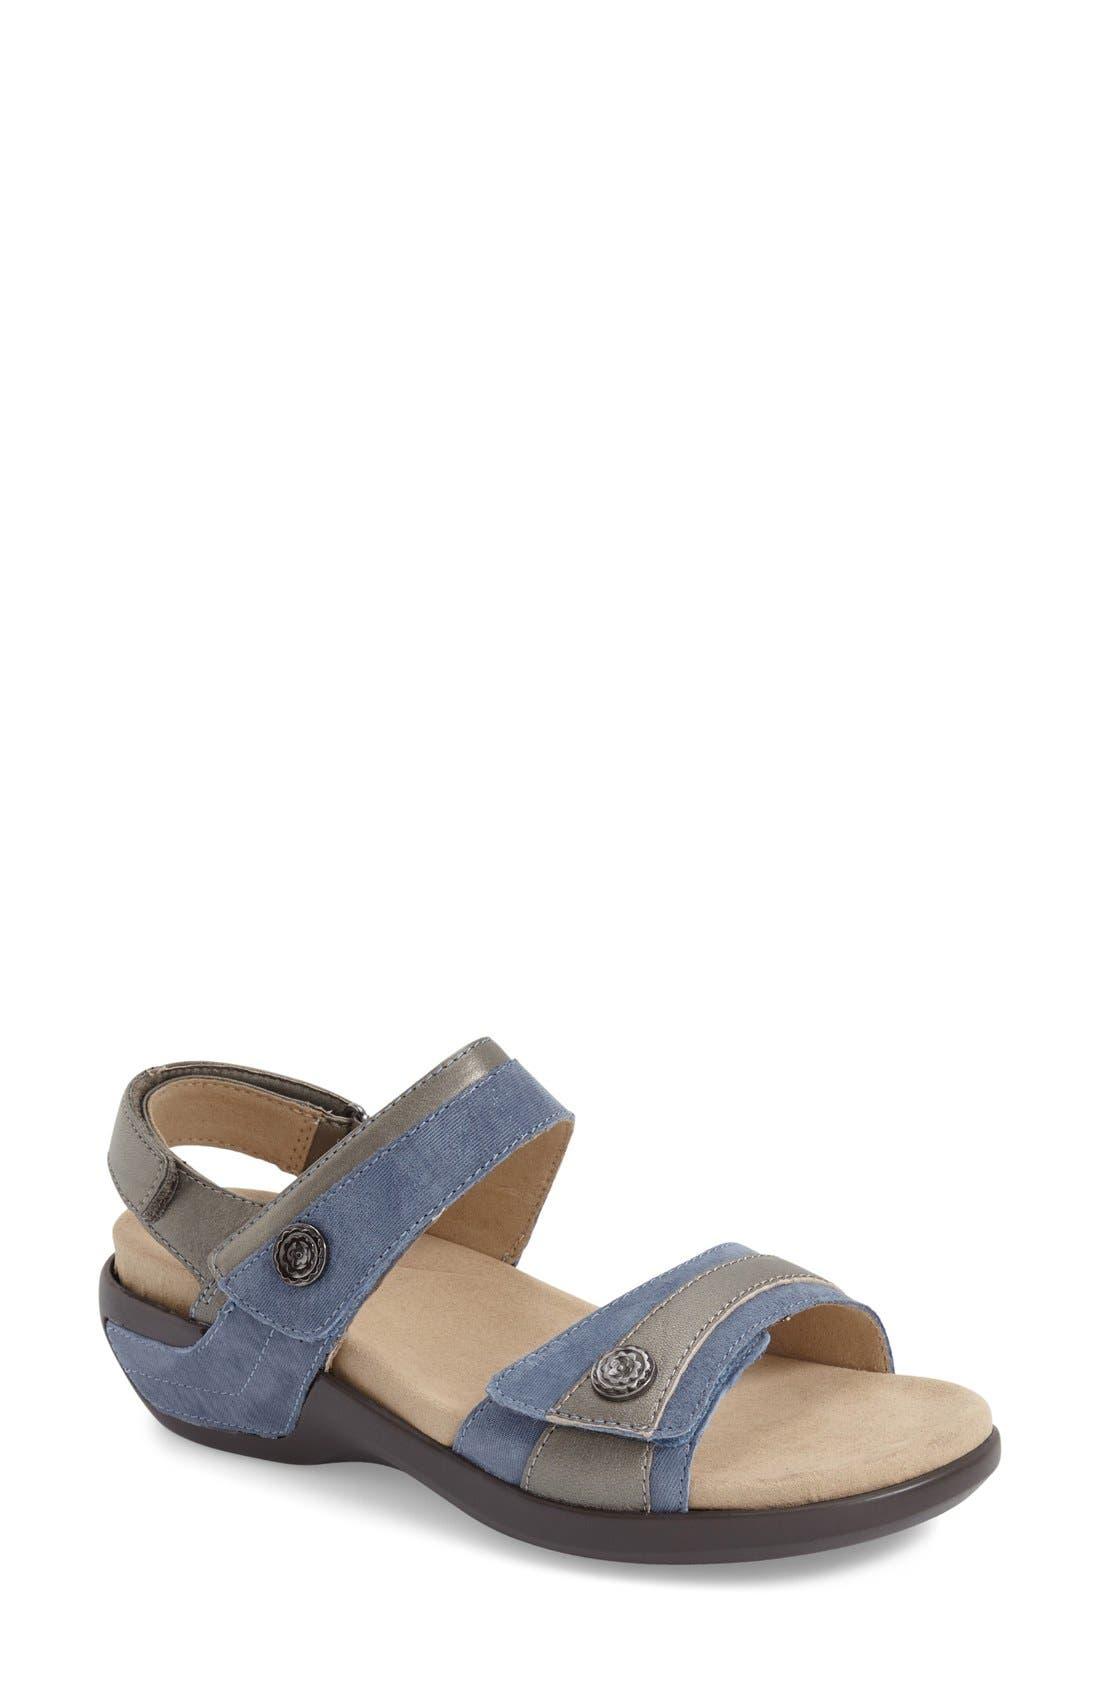 'Katherine' Sandal,                         Main,                         color, Blue Leather